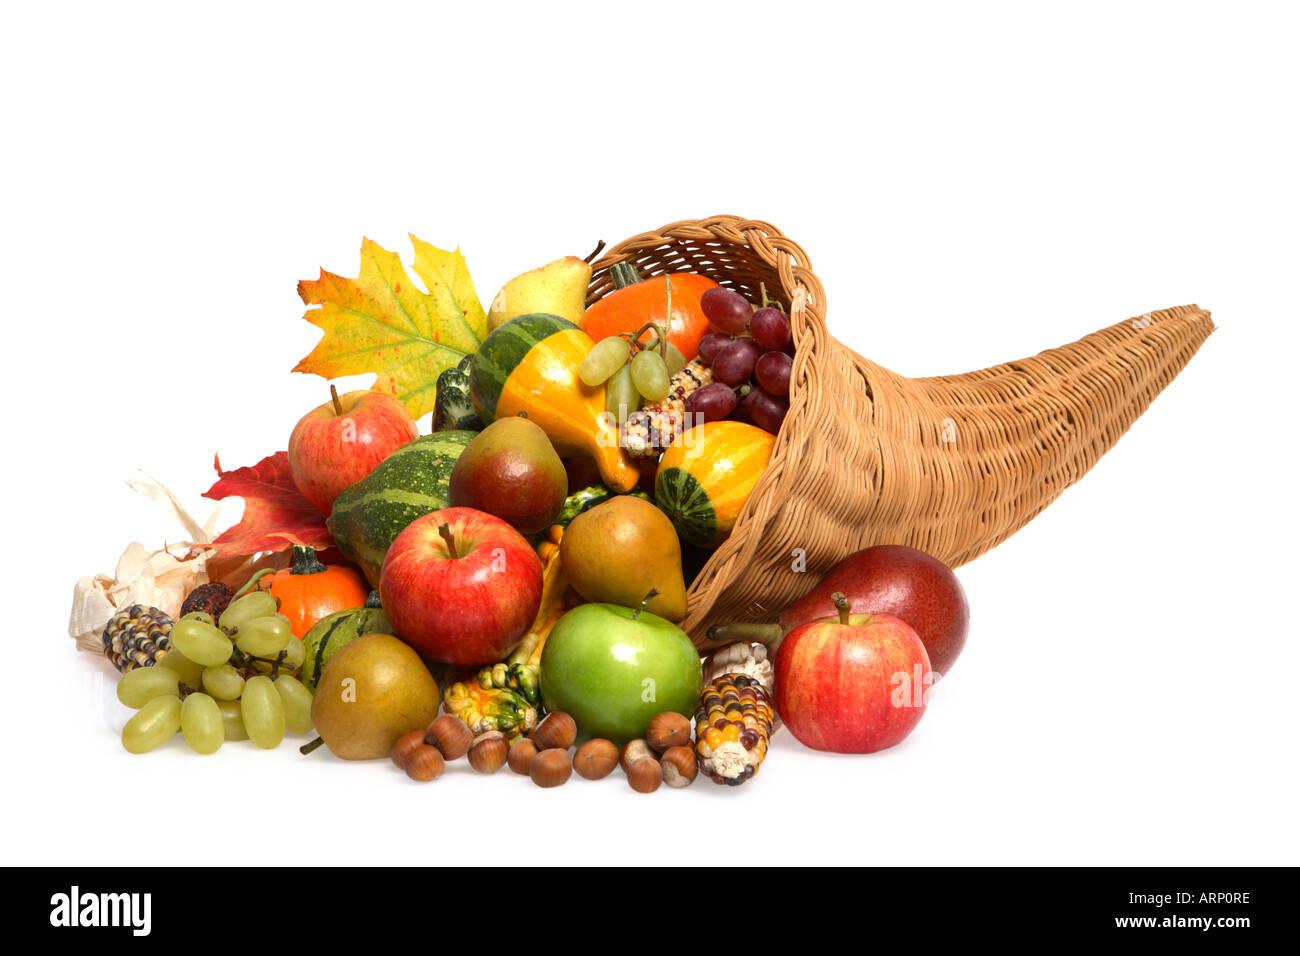 Fall Season Cornucopia - Stock Image